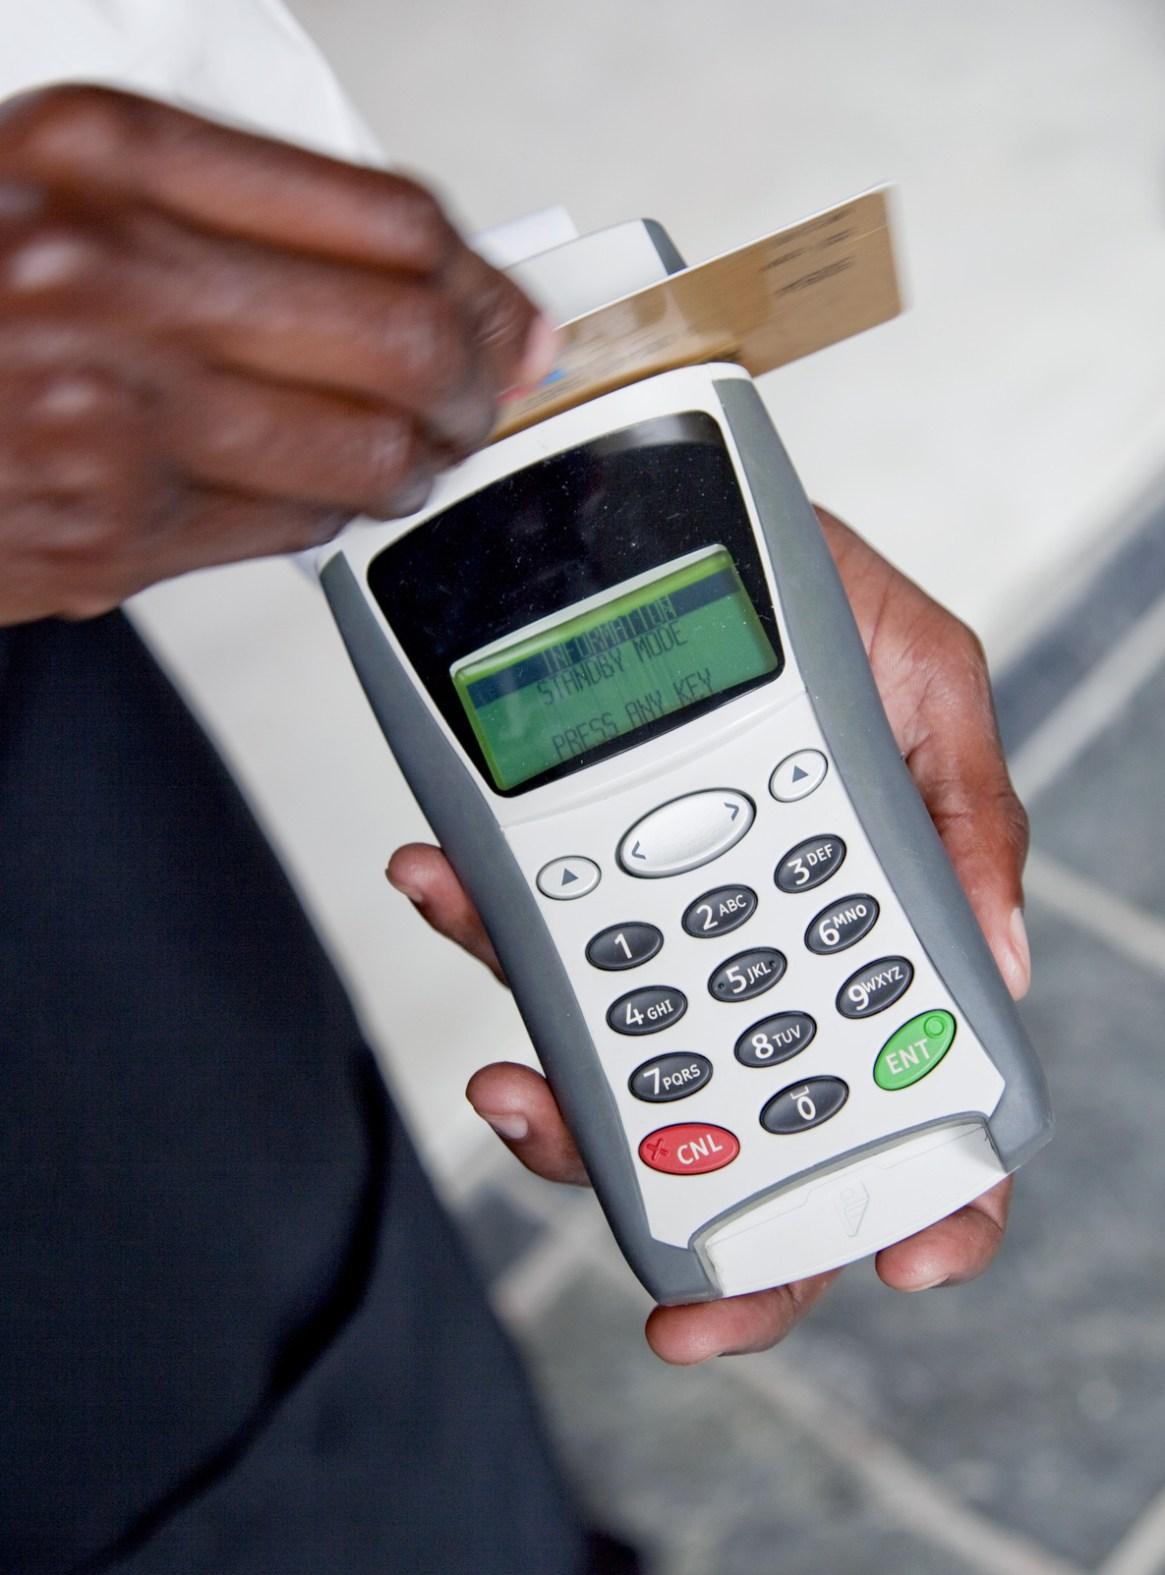 short-term merchant account to process credit card payments